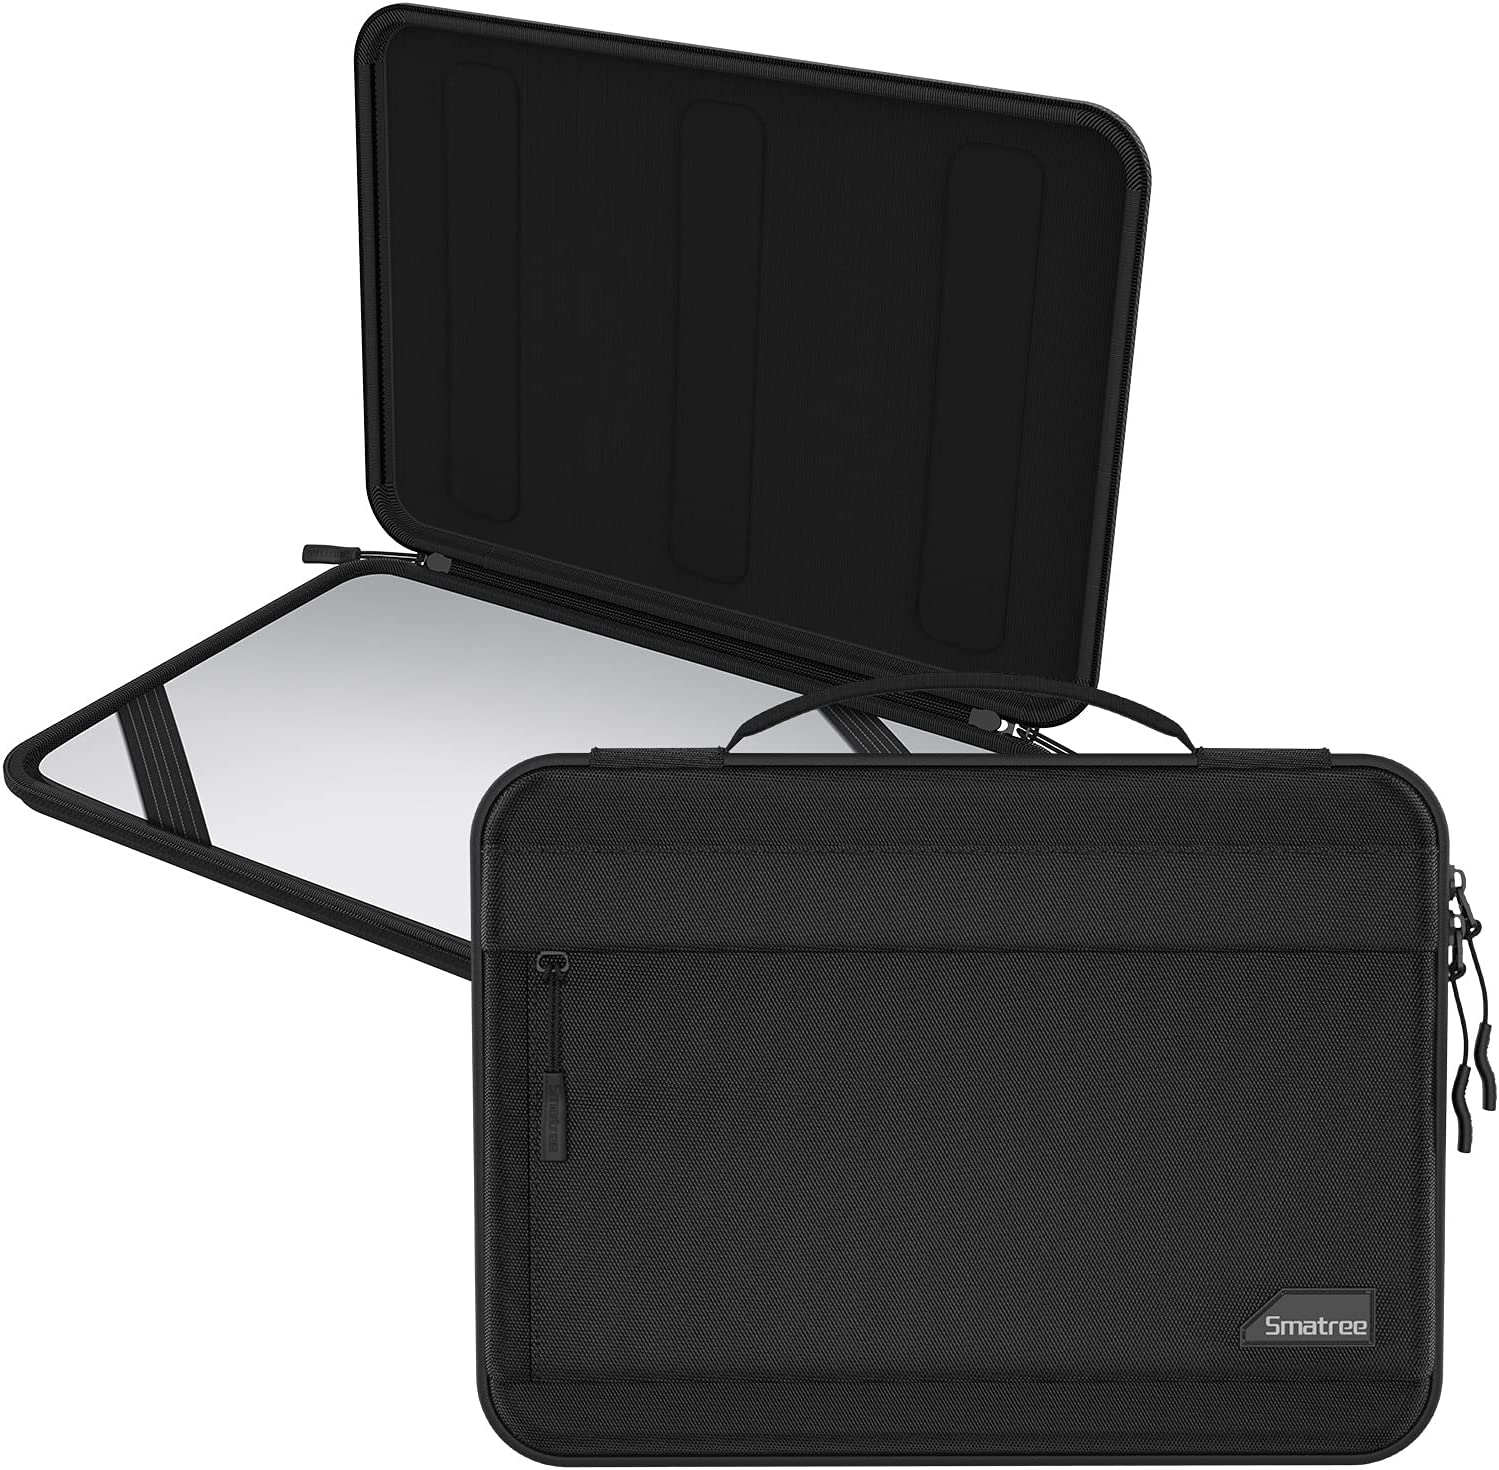 Smatree 13 inch Hard Sleeve Laptop Case Only for Dell Xps 13 9310, Lenovo Chromebook Flex 5 13